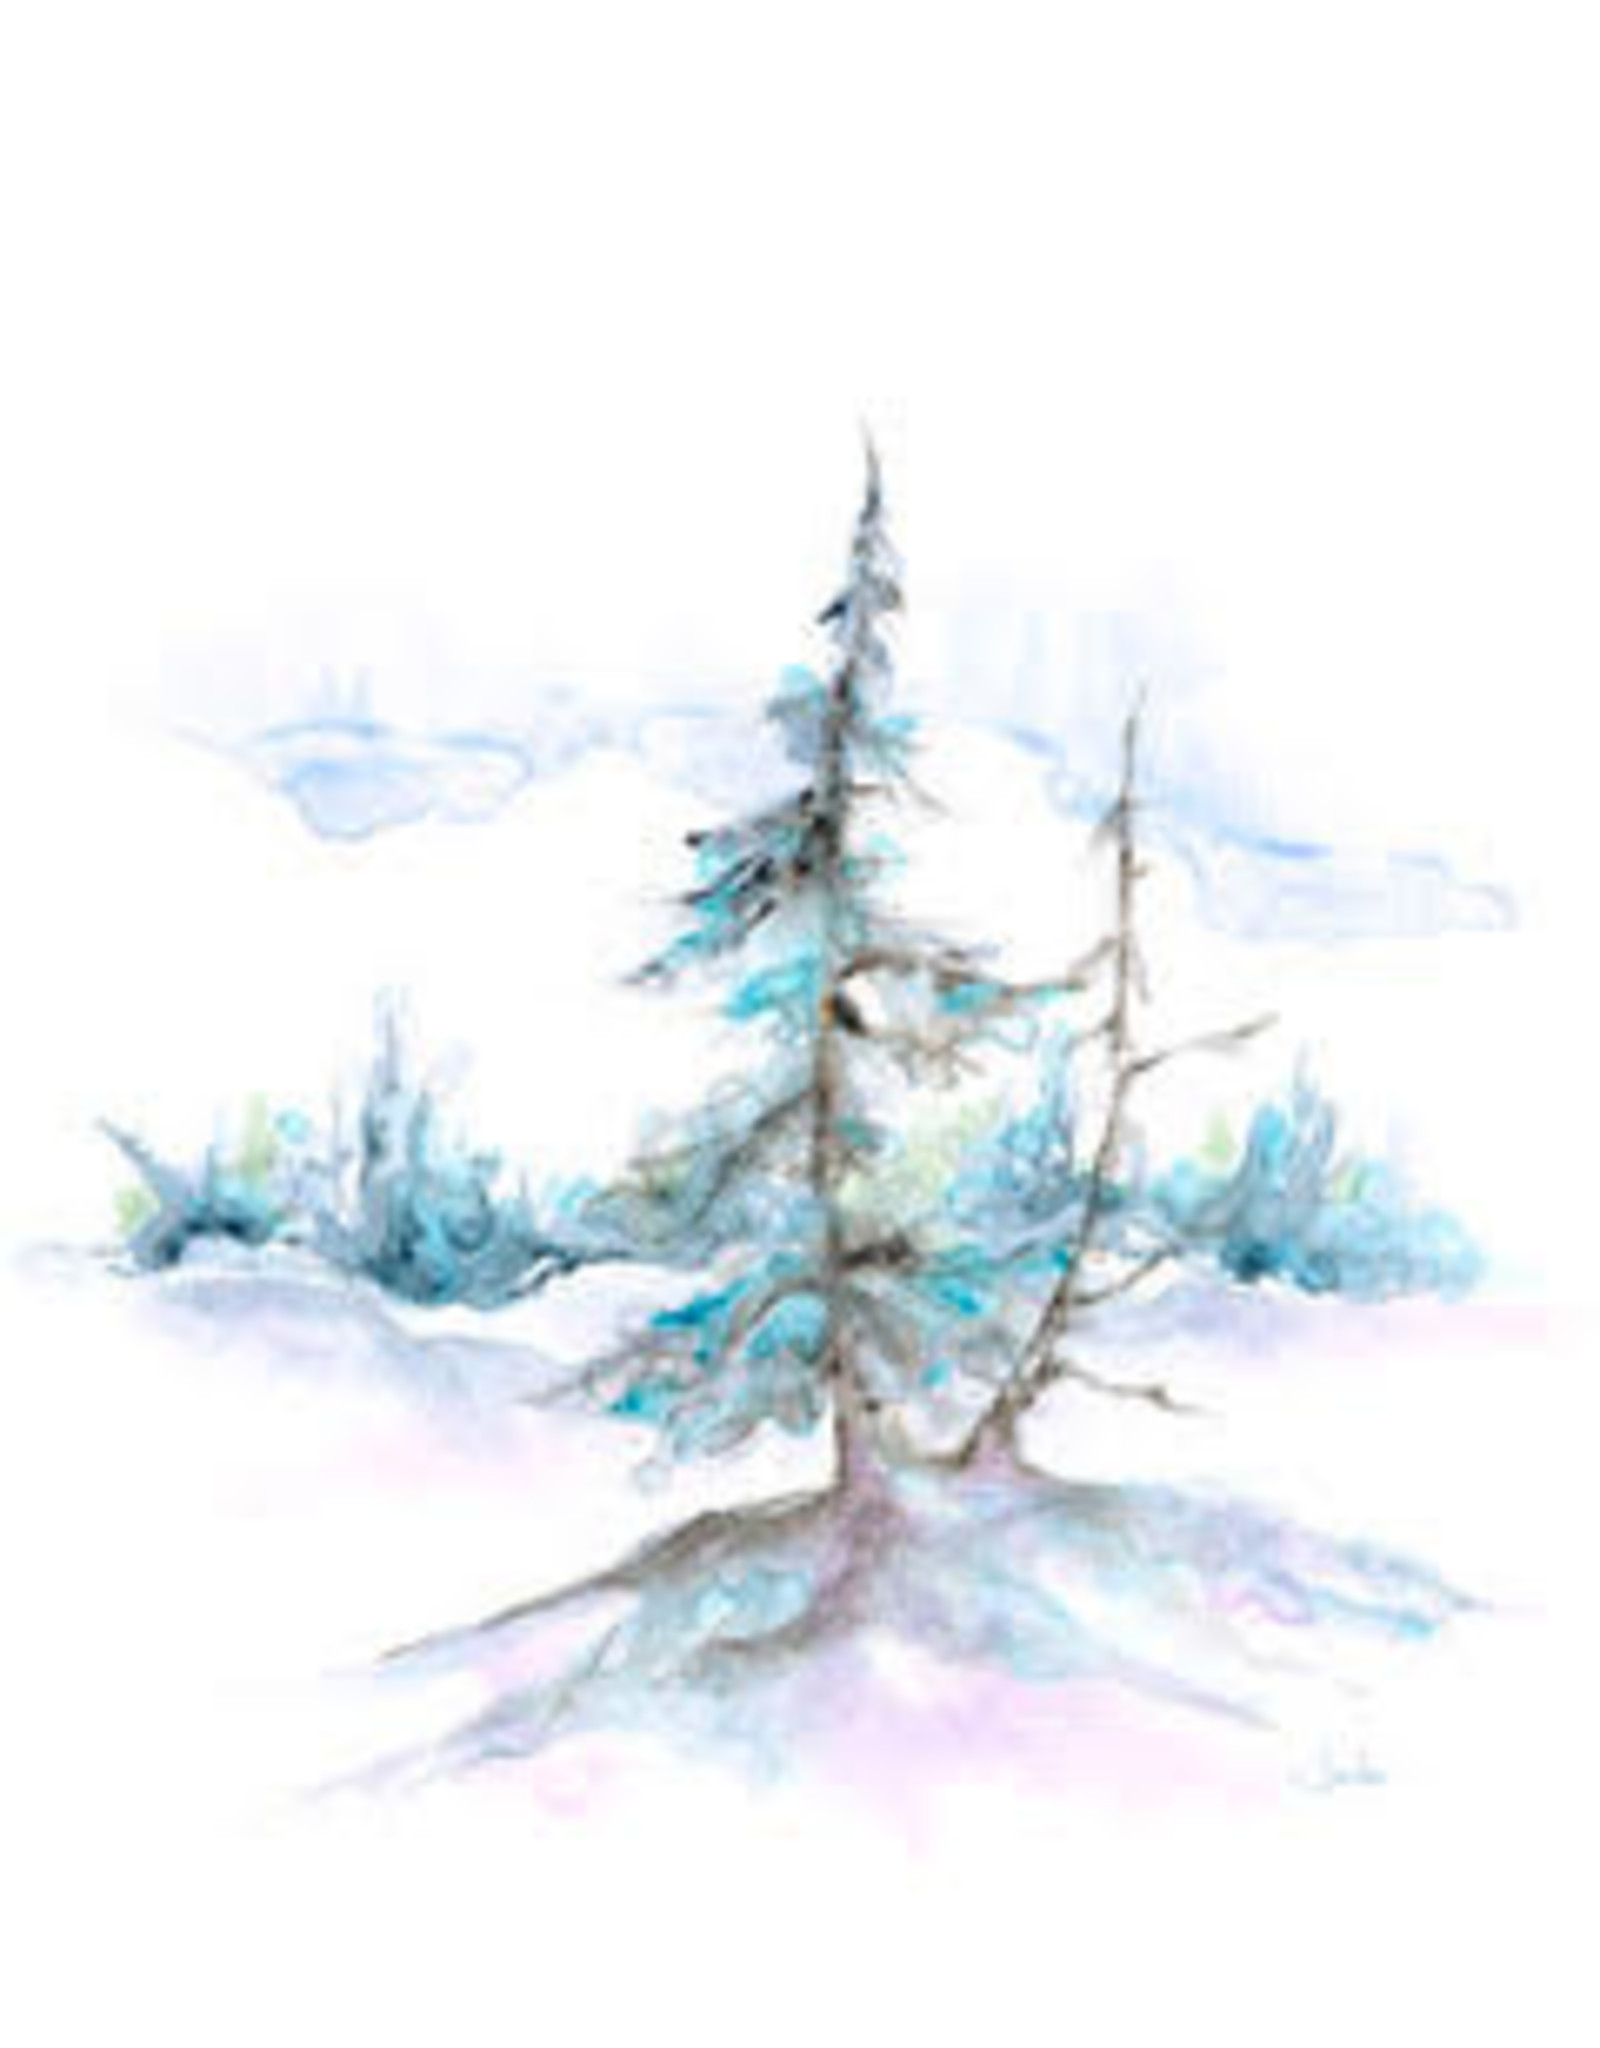 Wilderness (10062a)